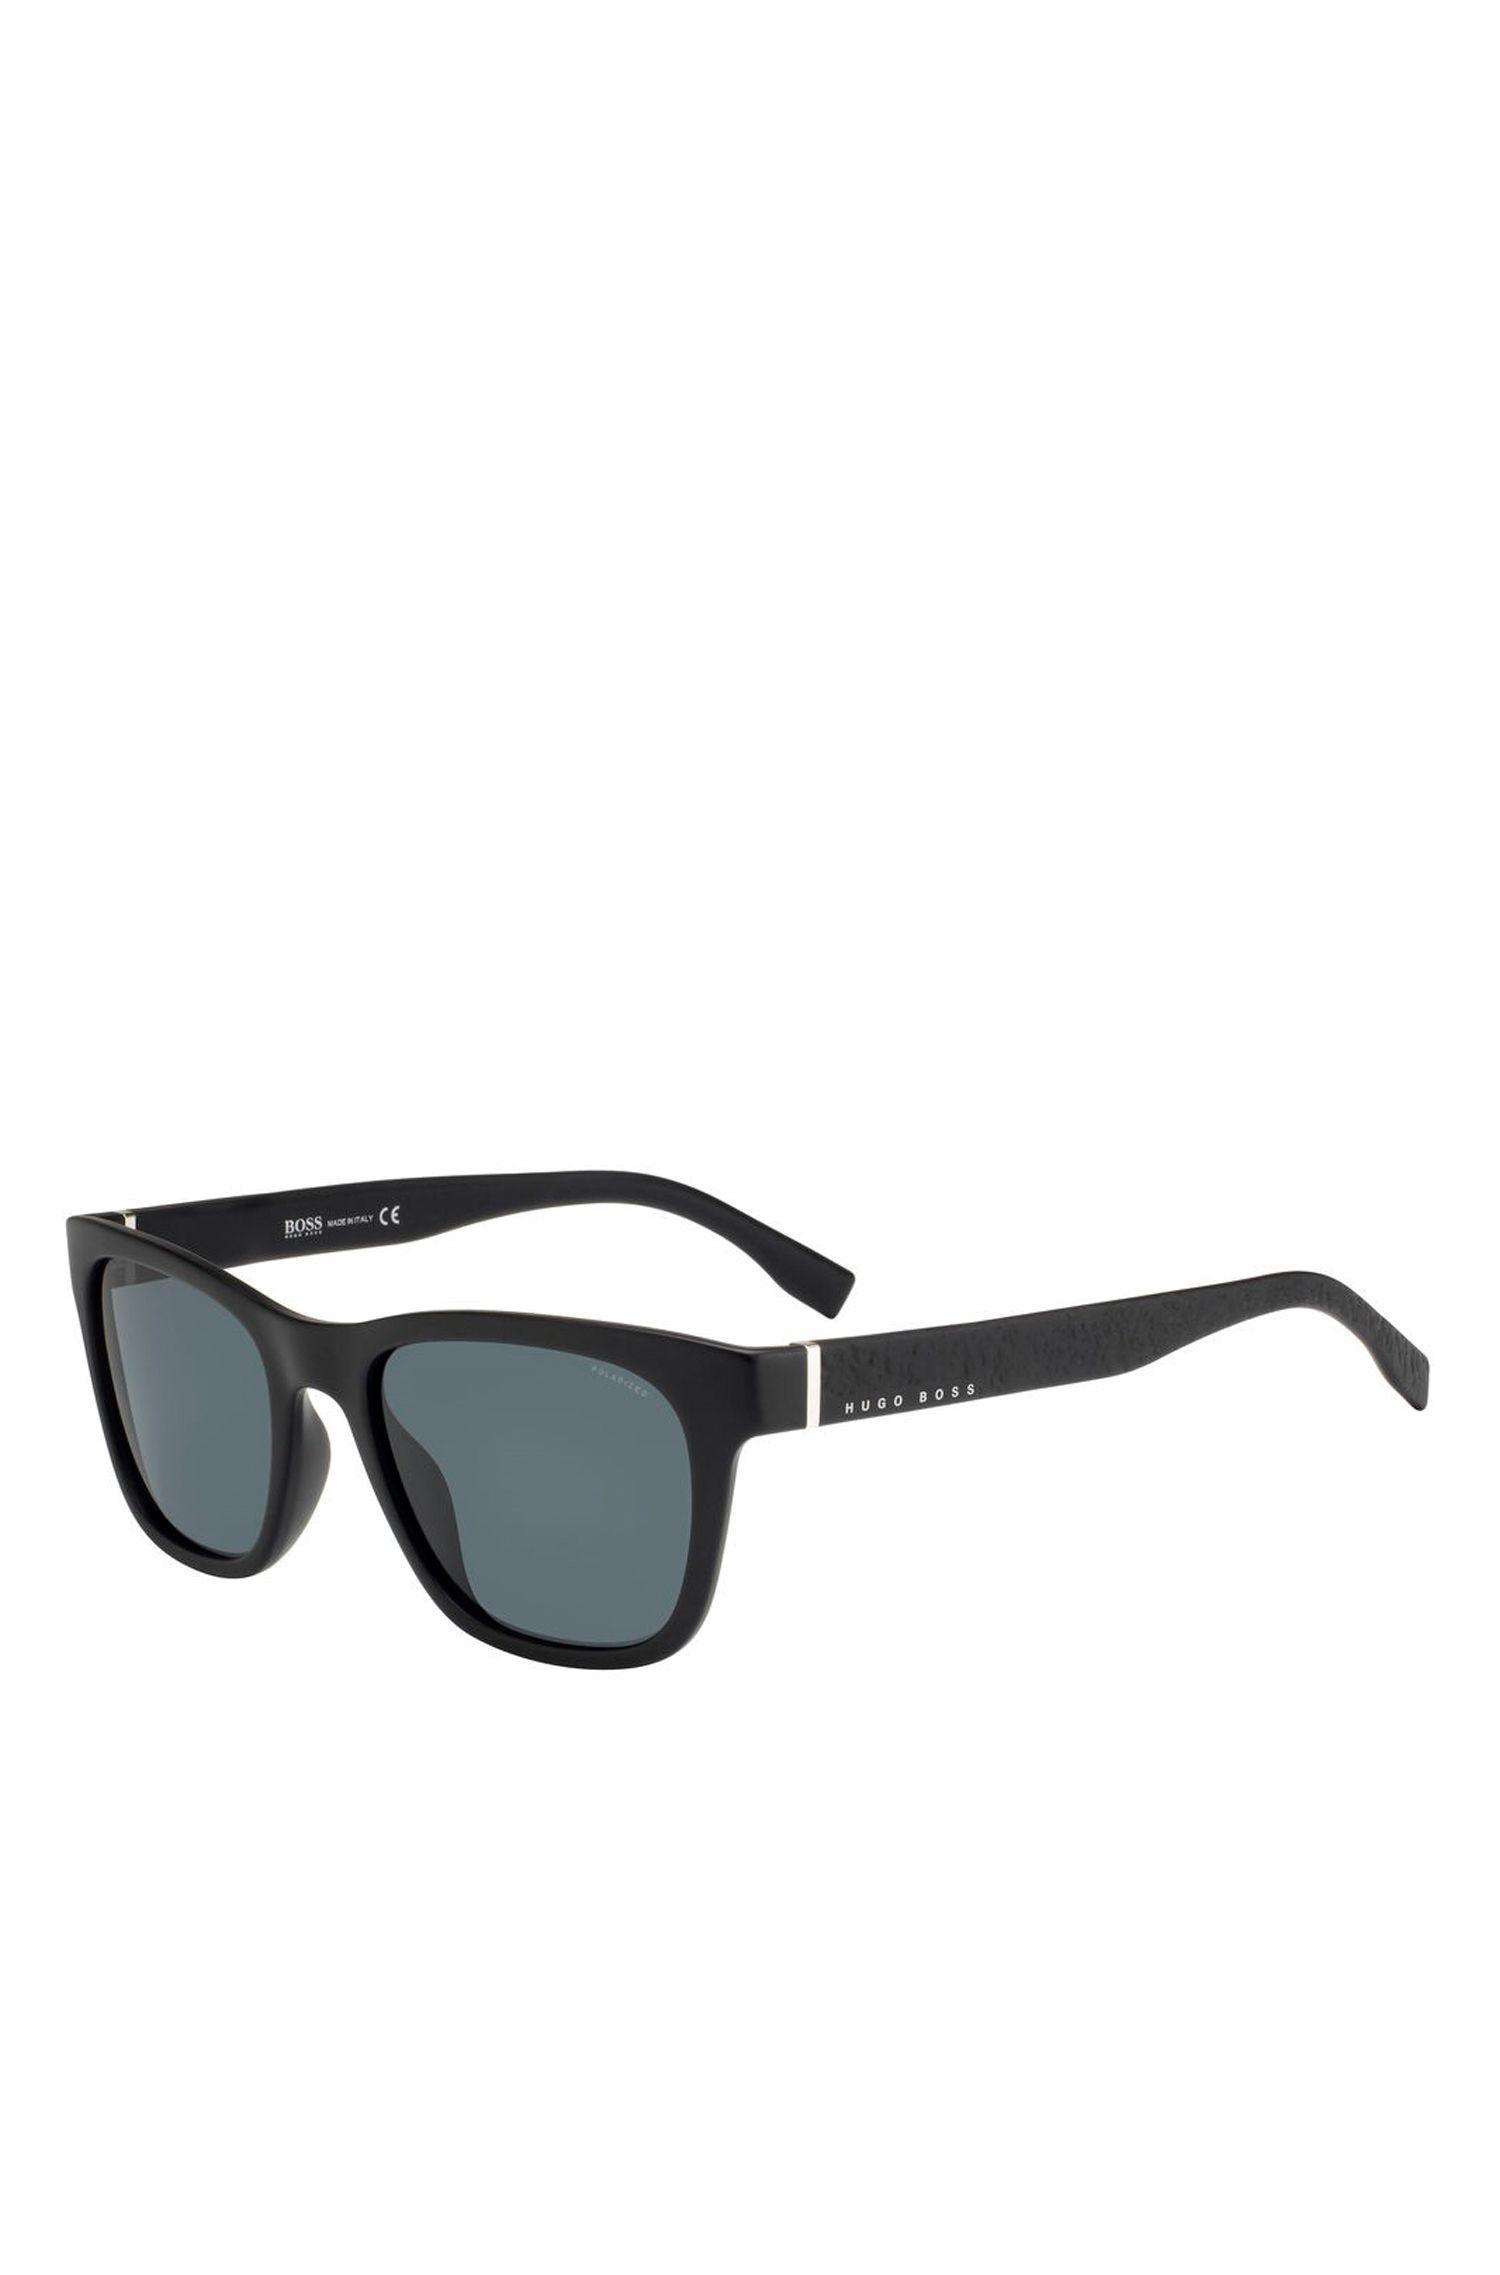 '0830S' | Black Lens Polarized Optyl Square Sunglasses